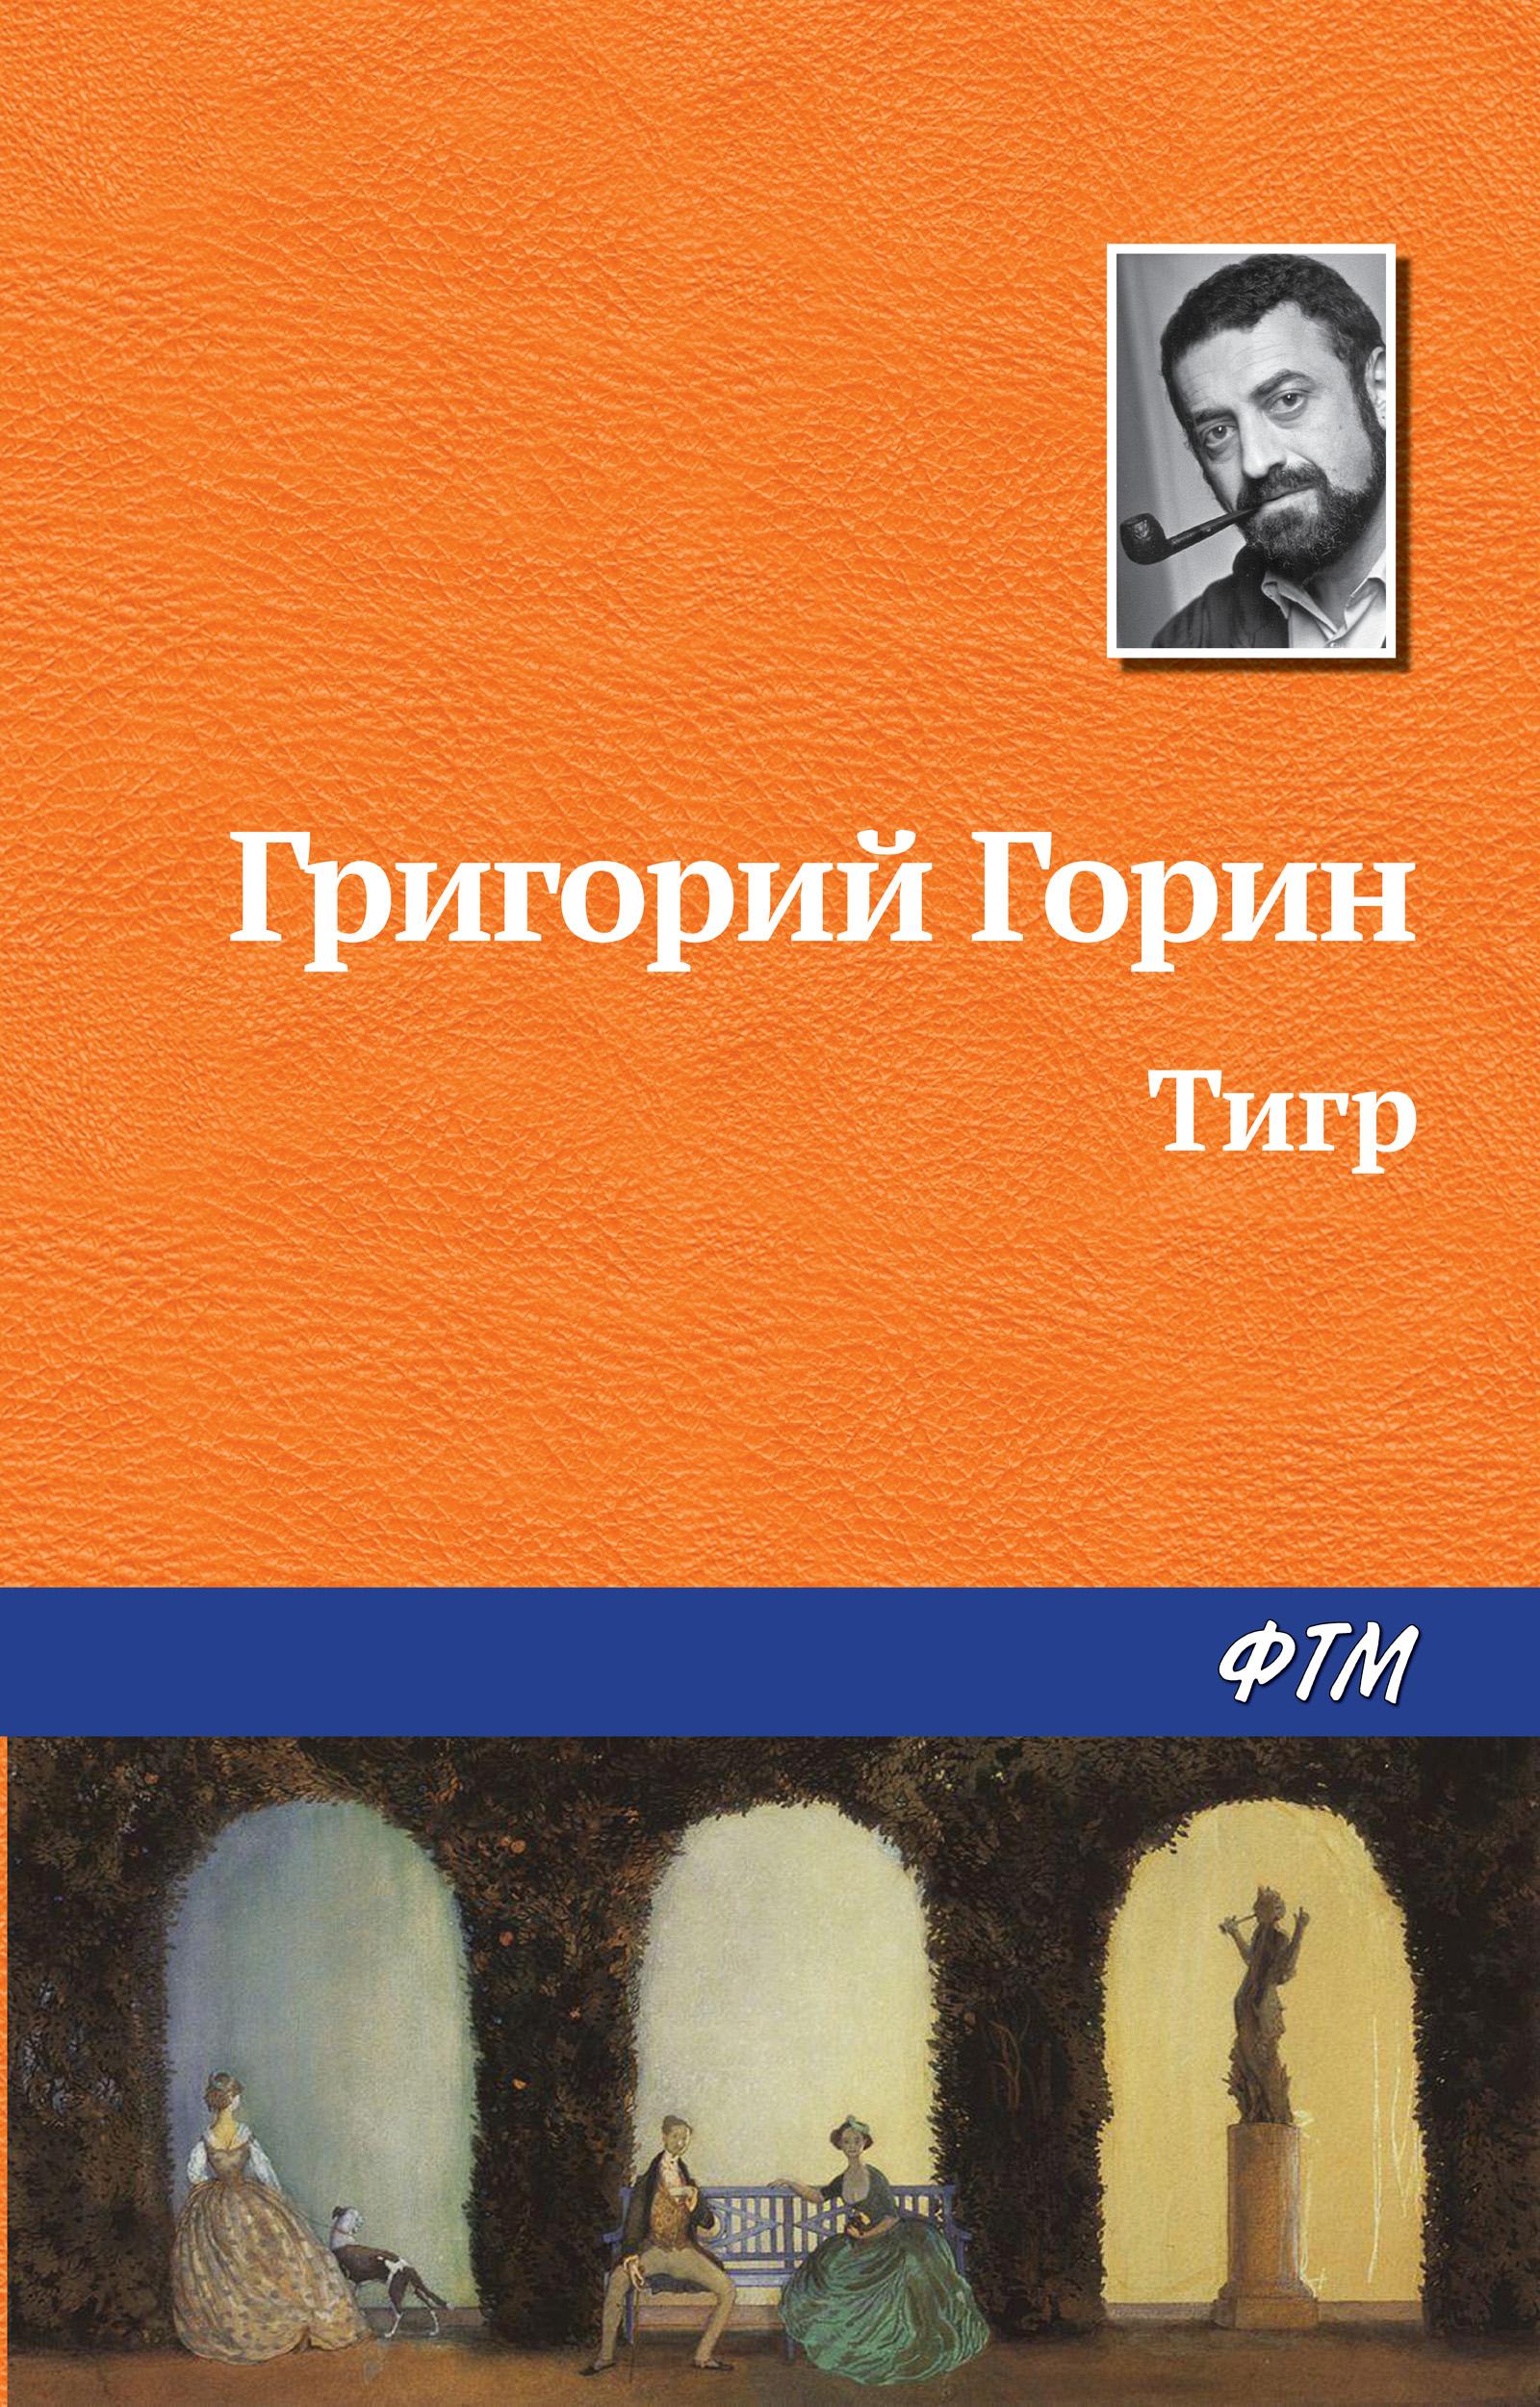 цены на Григорий Горин Тигр  в интернет-магазинах